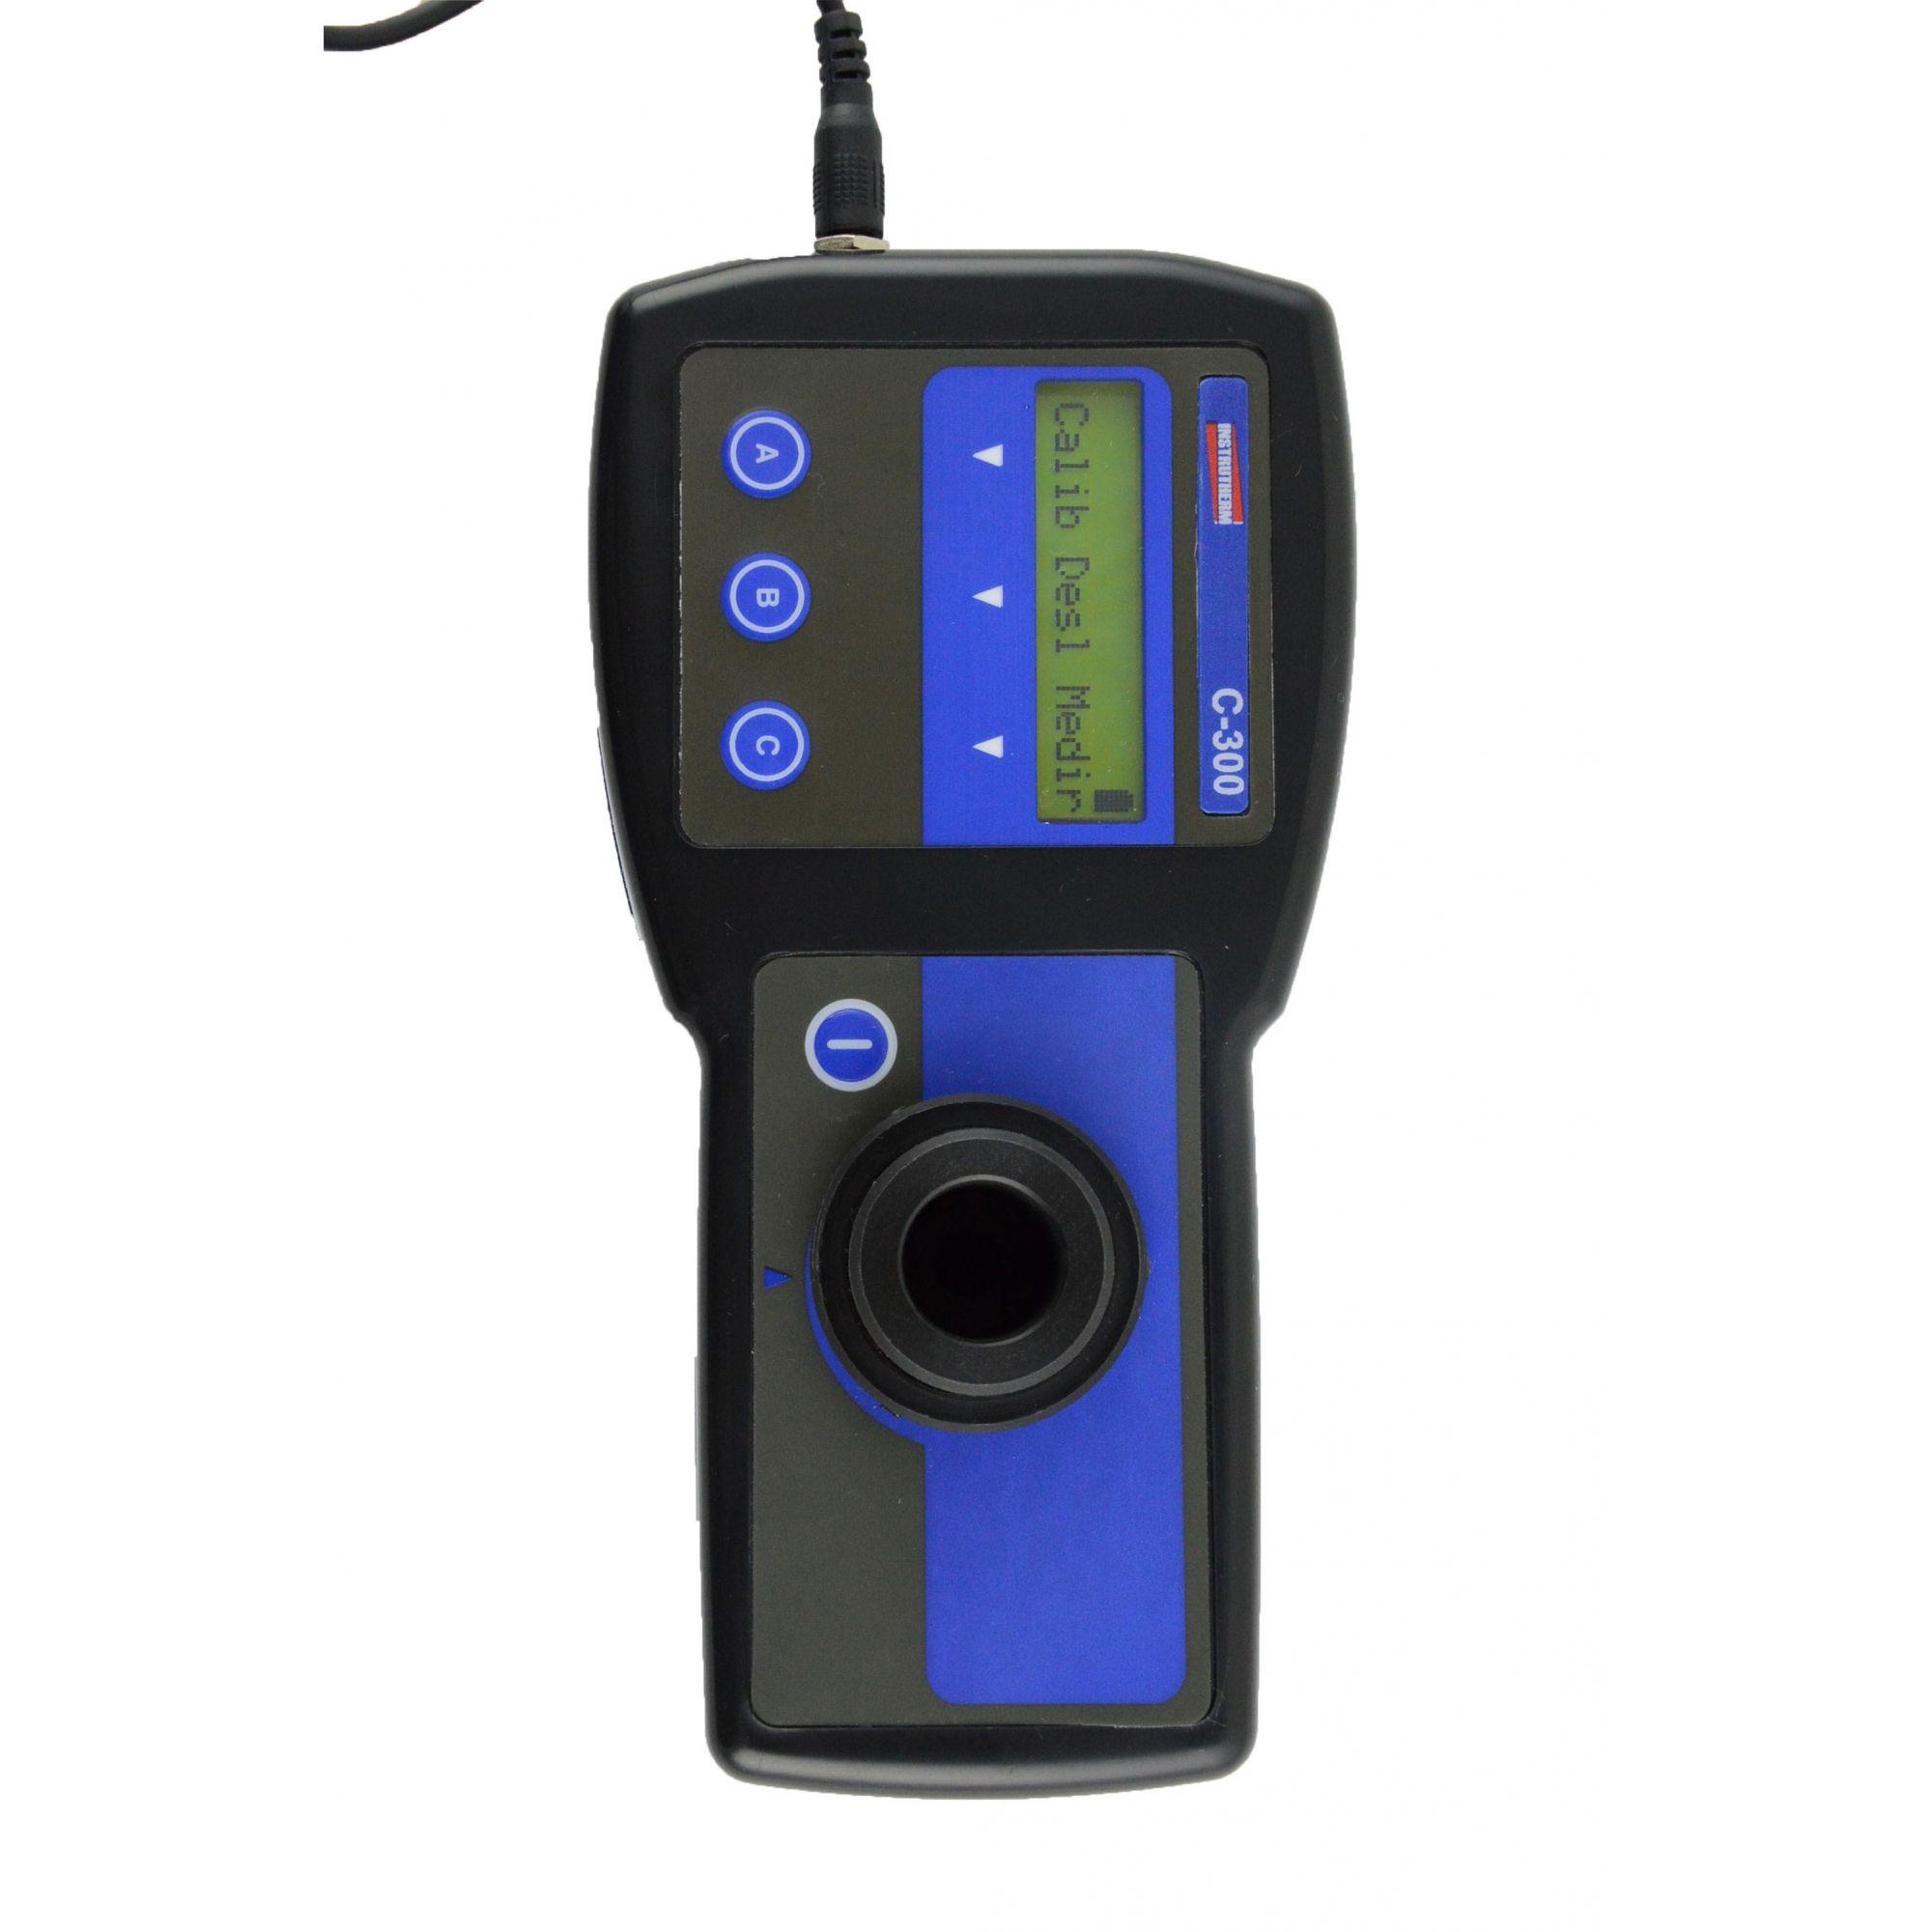 Medidor de cloro Digital portátil onda 520 NM livre e total MOD. C-300